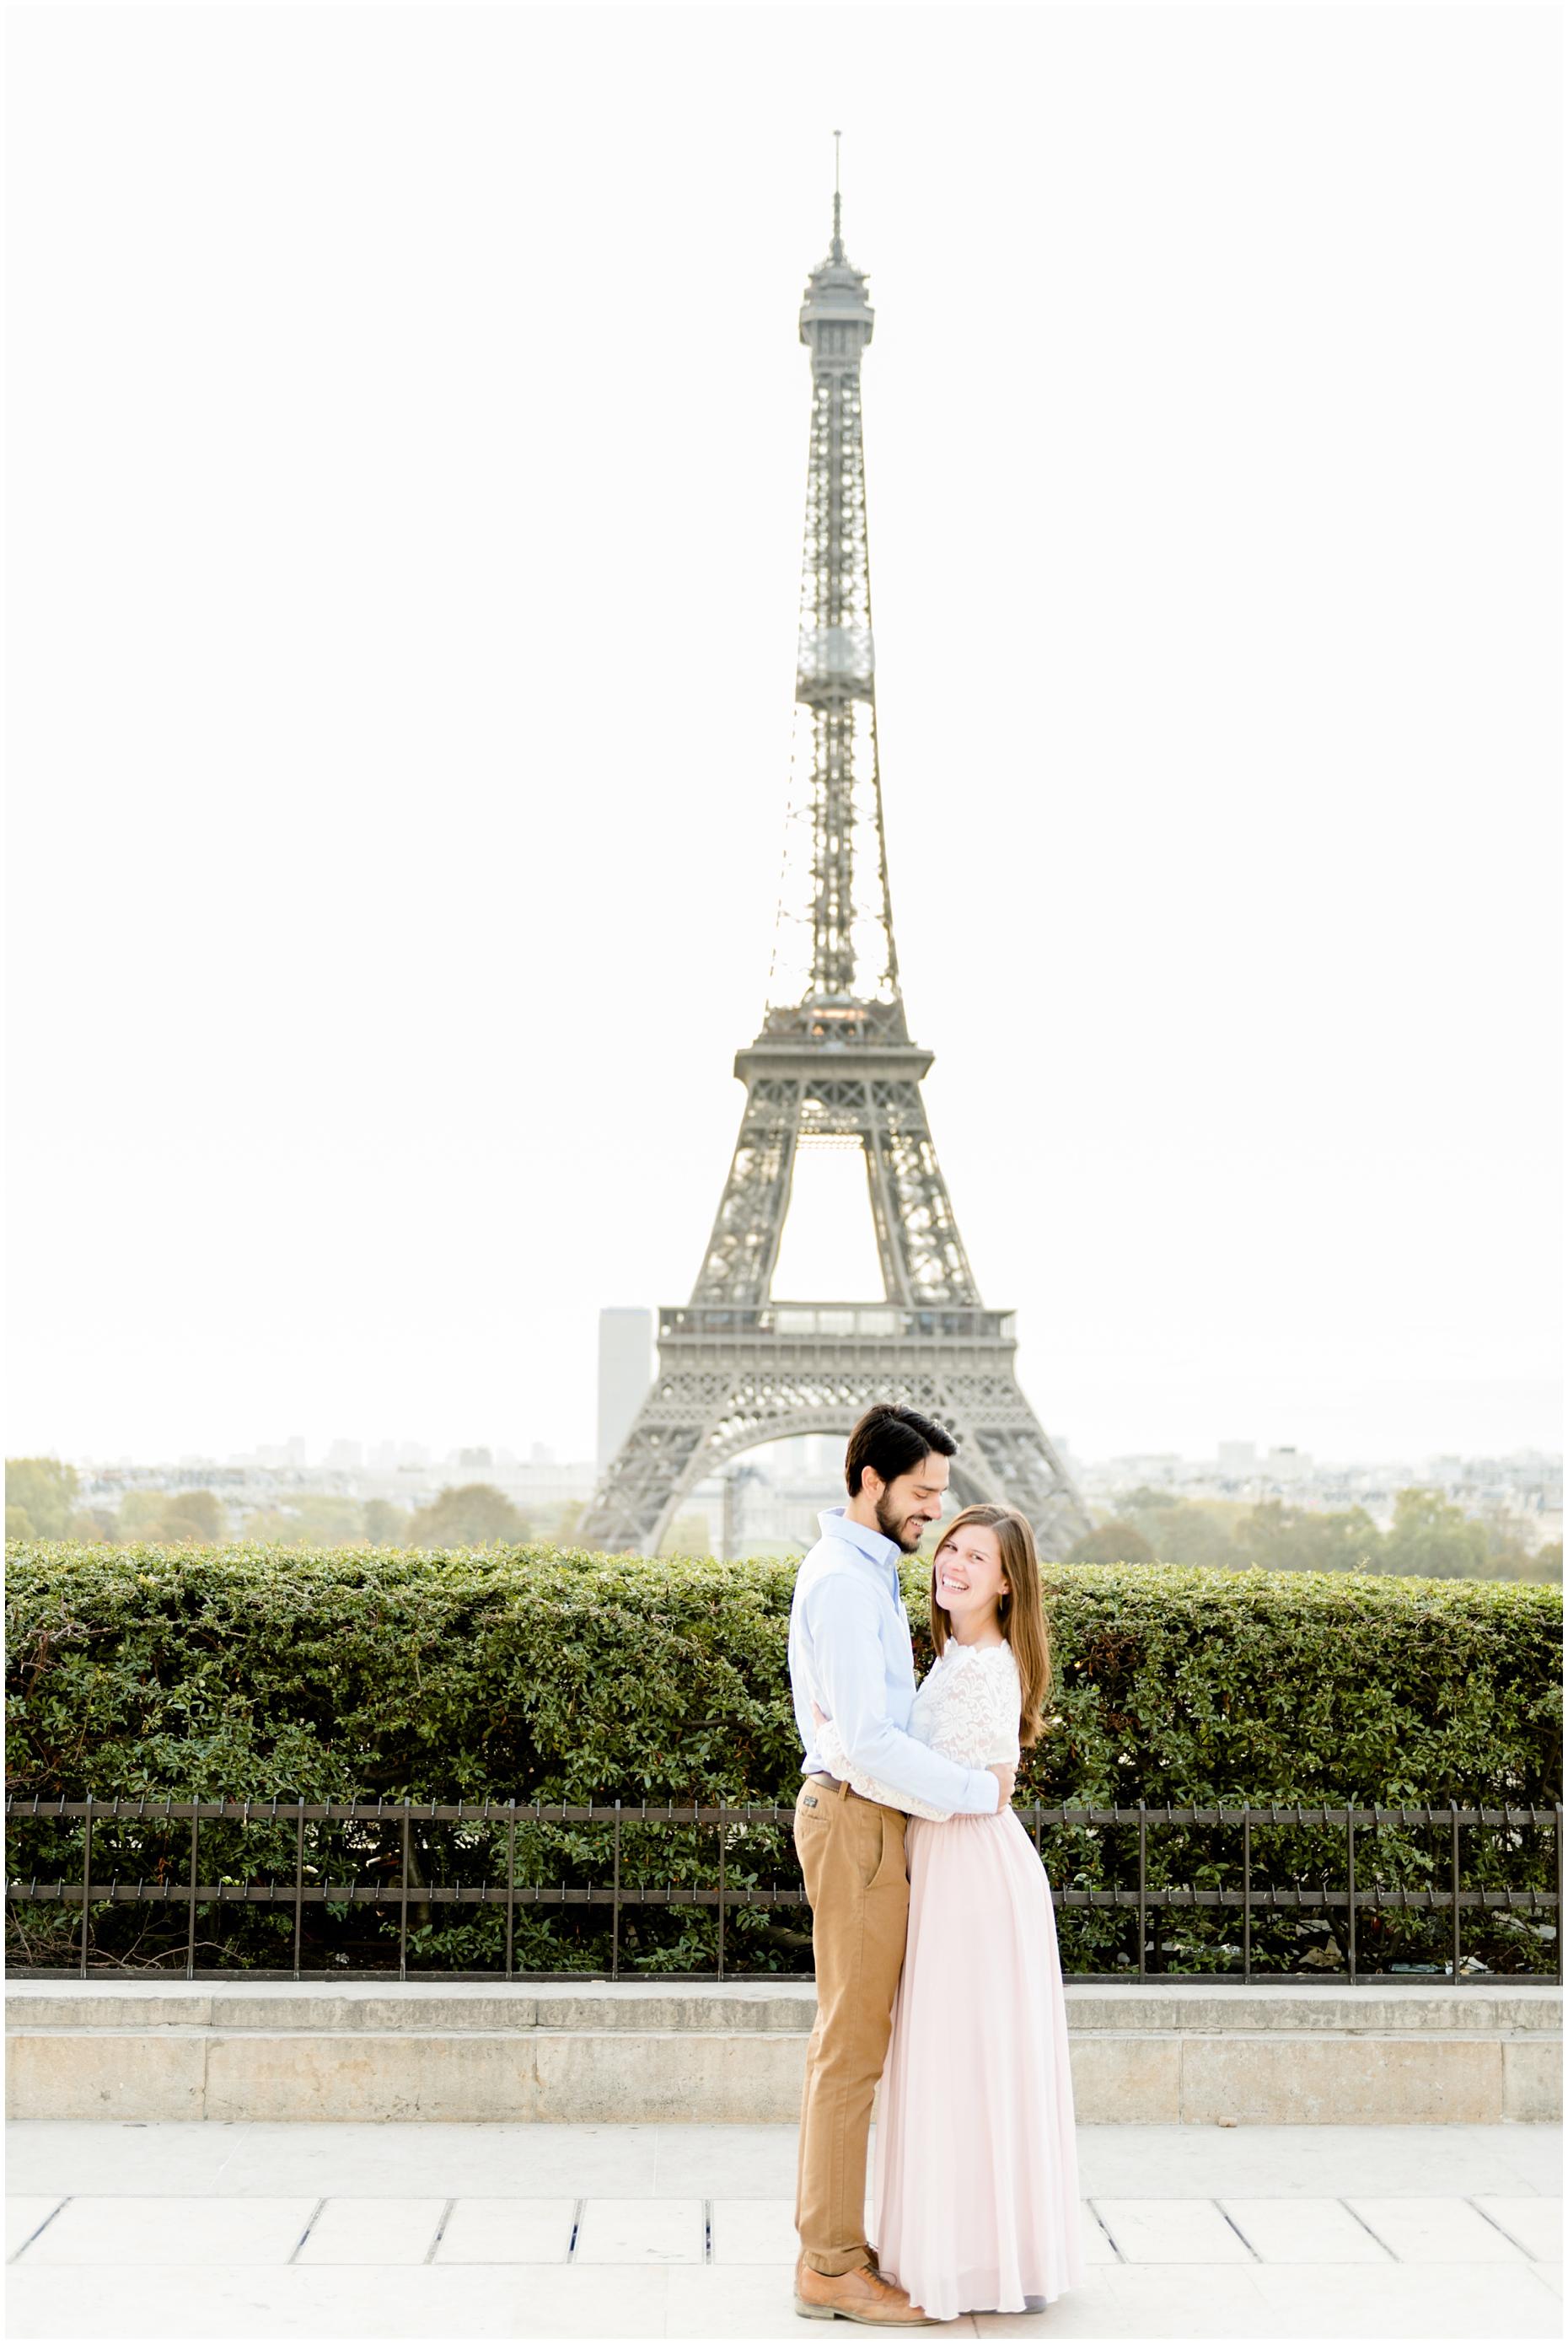 paris_france_eiffel_tower_trocadero_photo_session_english